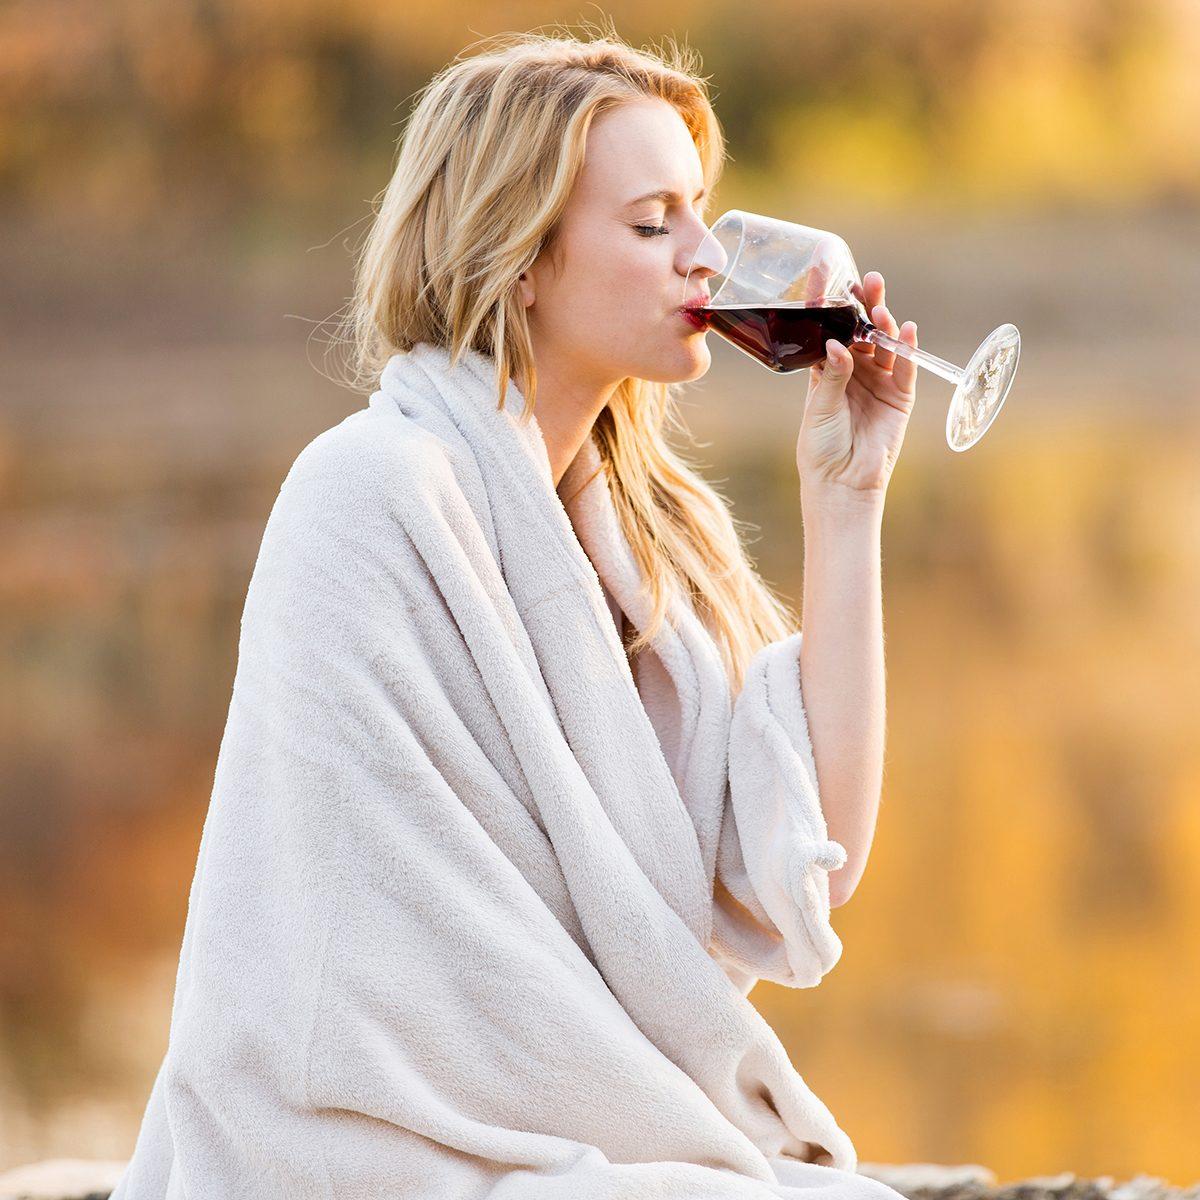 beautiful blond woman drinking red wine at sunset